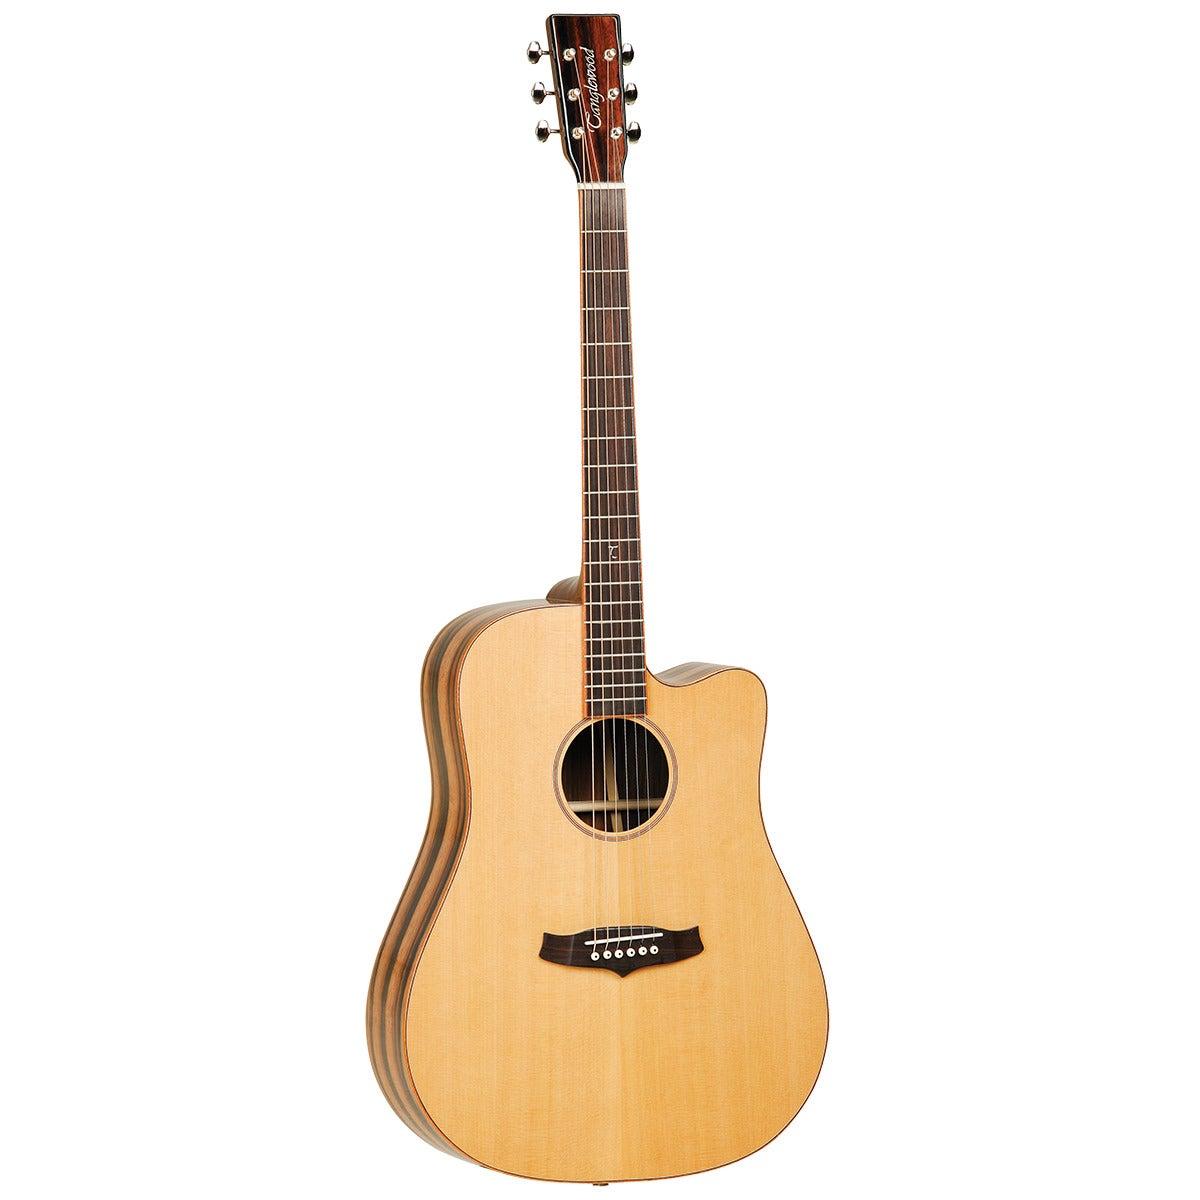 Tanglewood TWJDCE Java Dreadnought C/E Acoustic Guitar